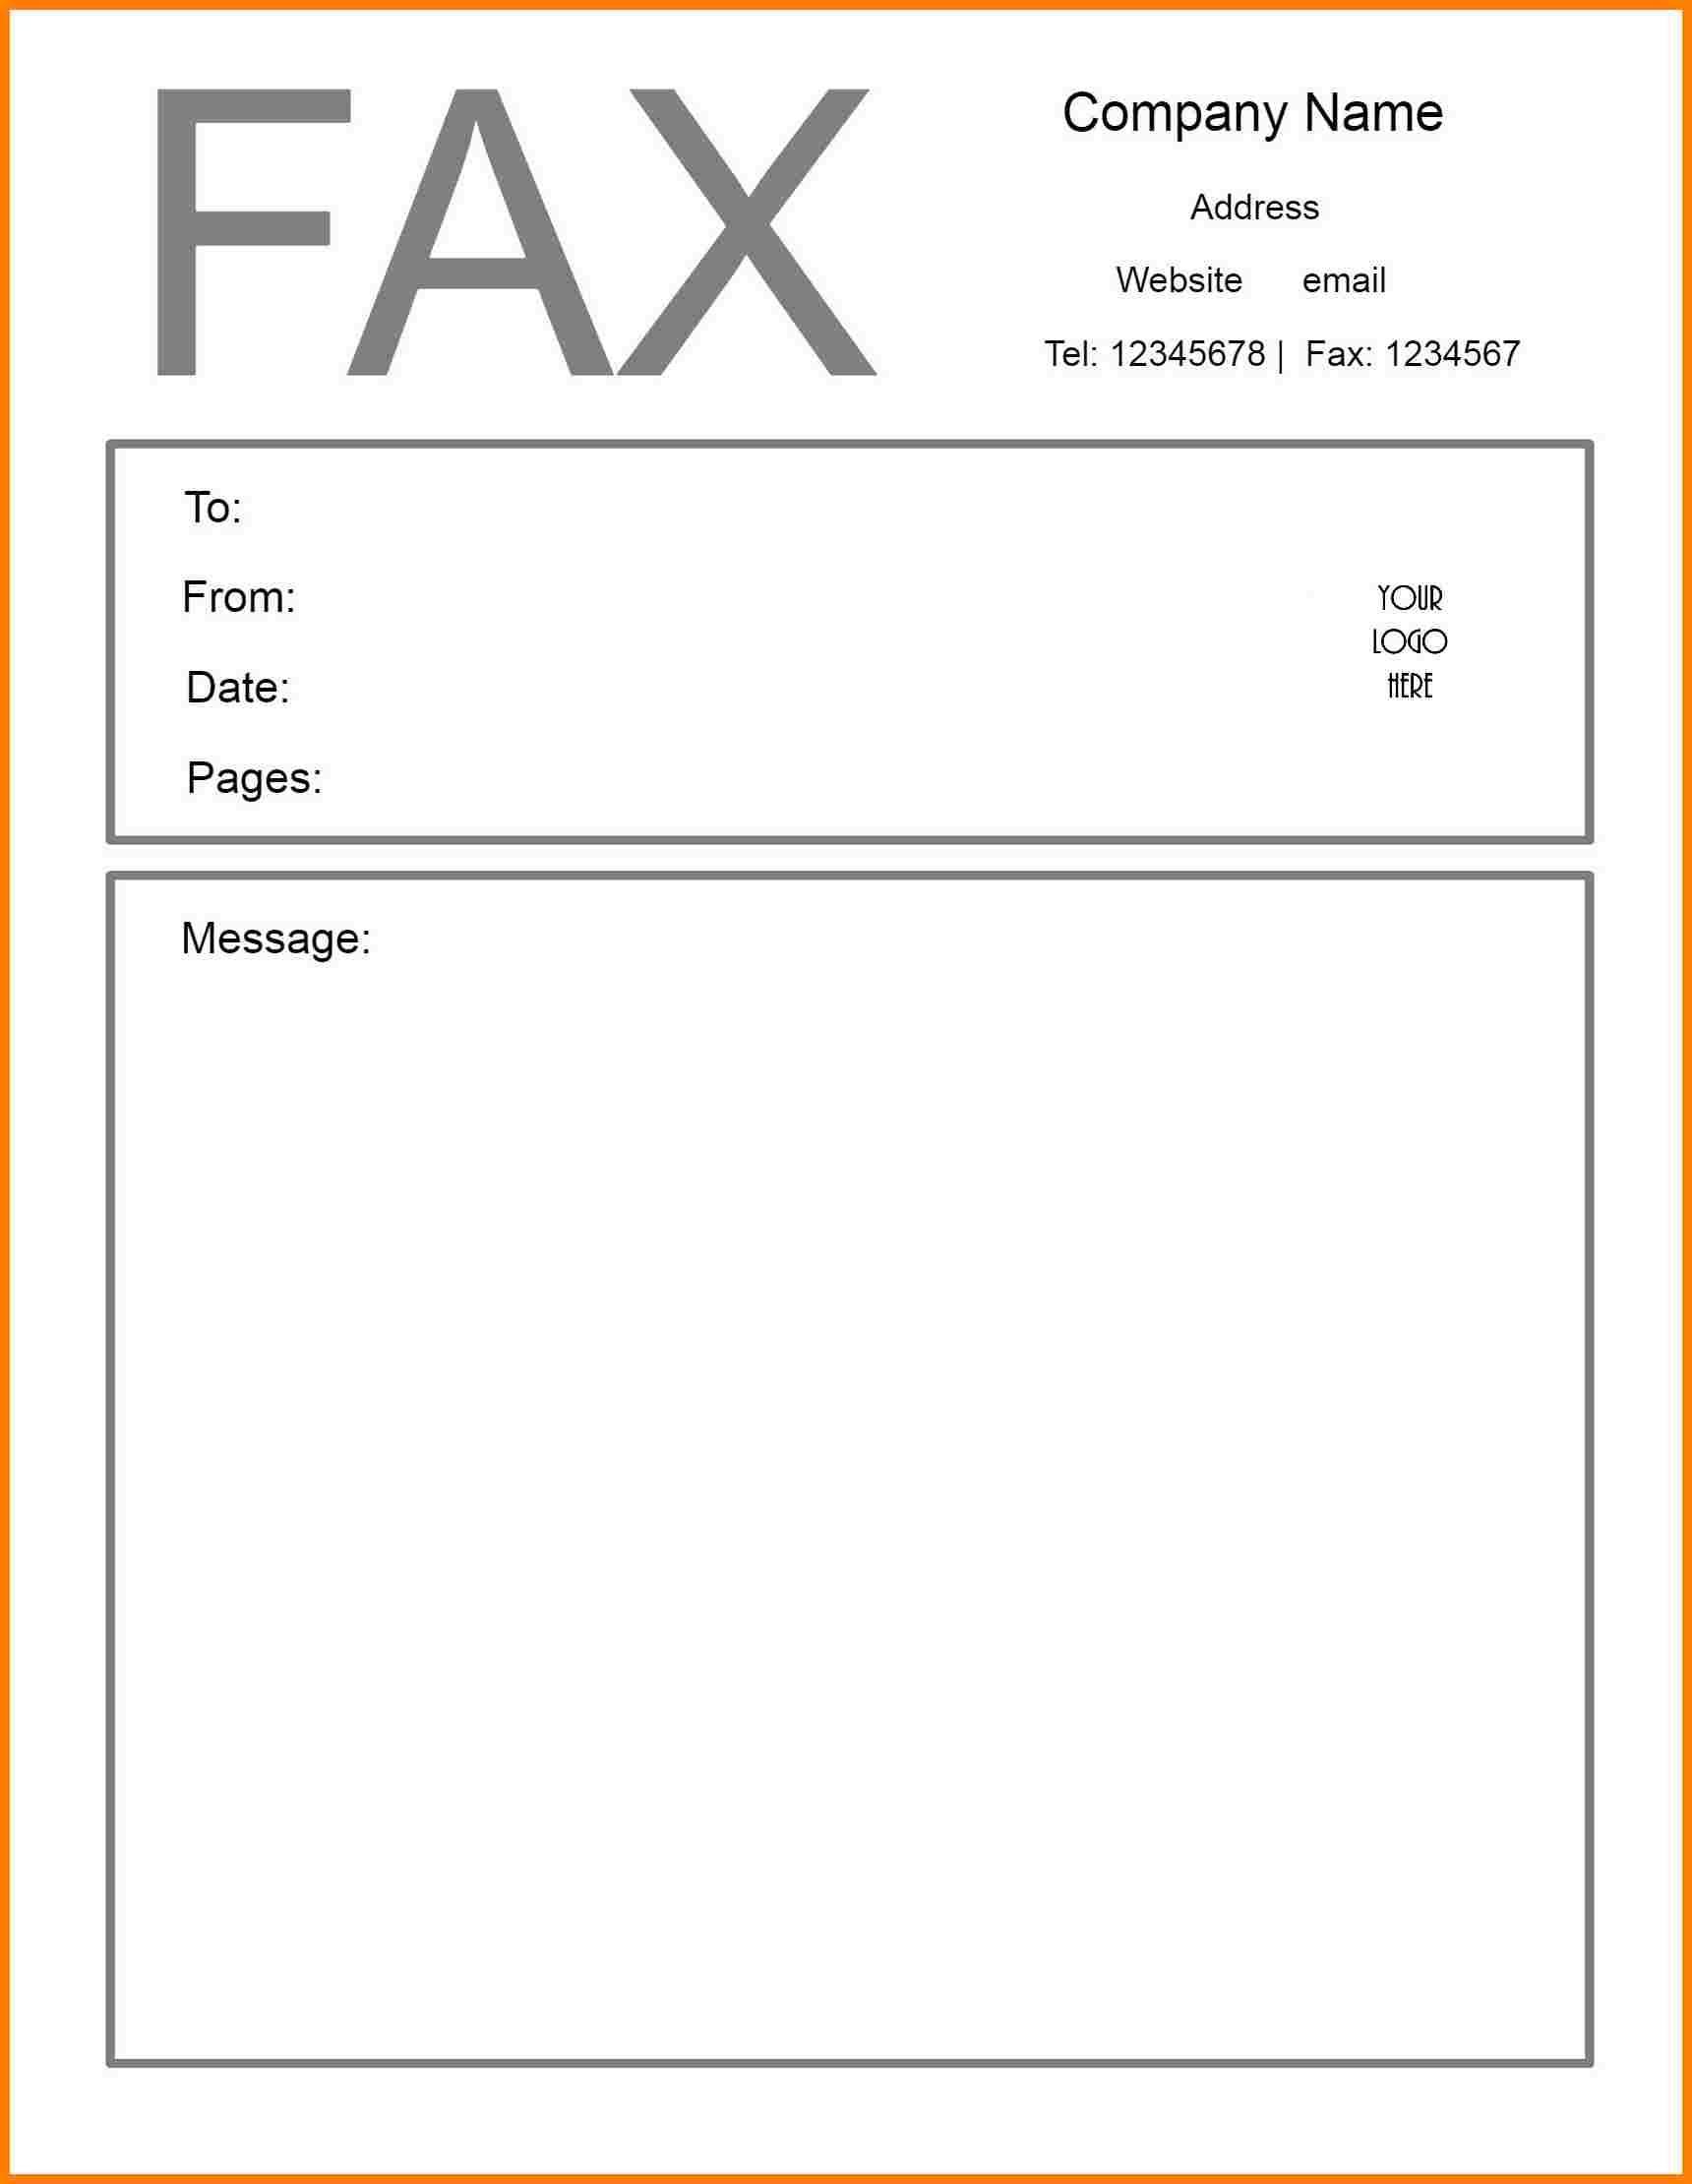 Free Printable Fax Cover Sheet   Printable Fax Cover Sheet - Free Printable Cover Letter For Fax